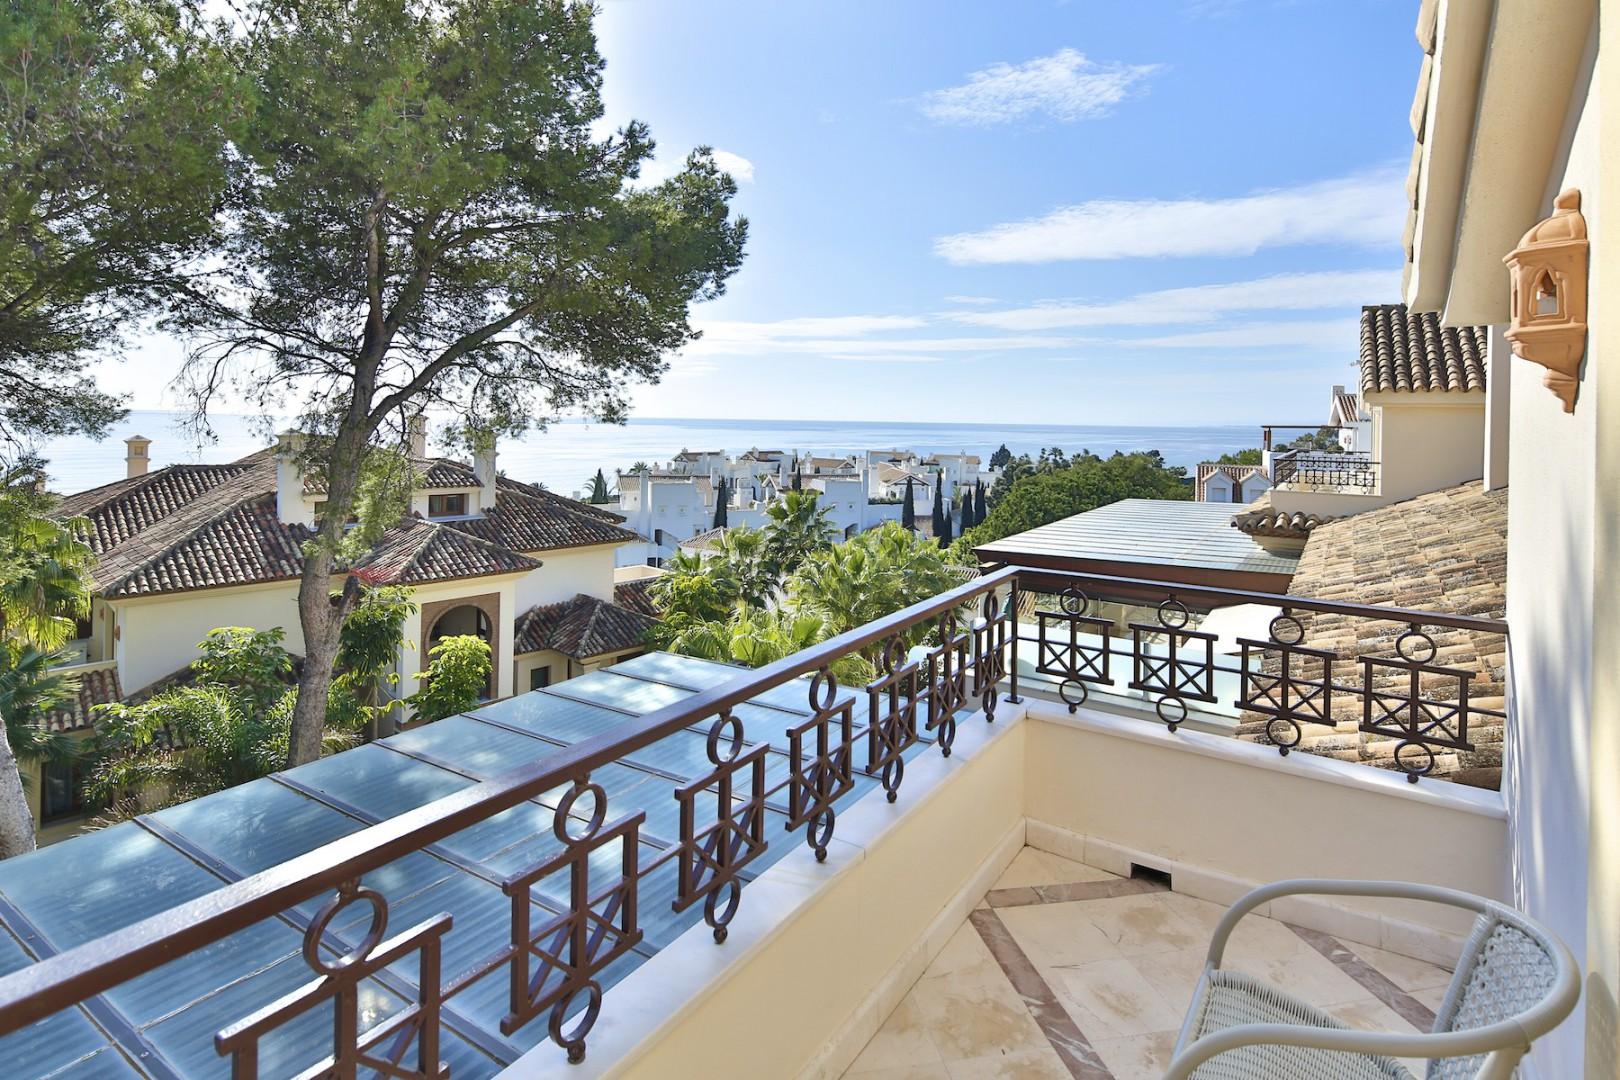 Penthouse-Duplex in Marbella